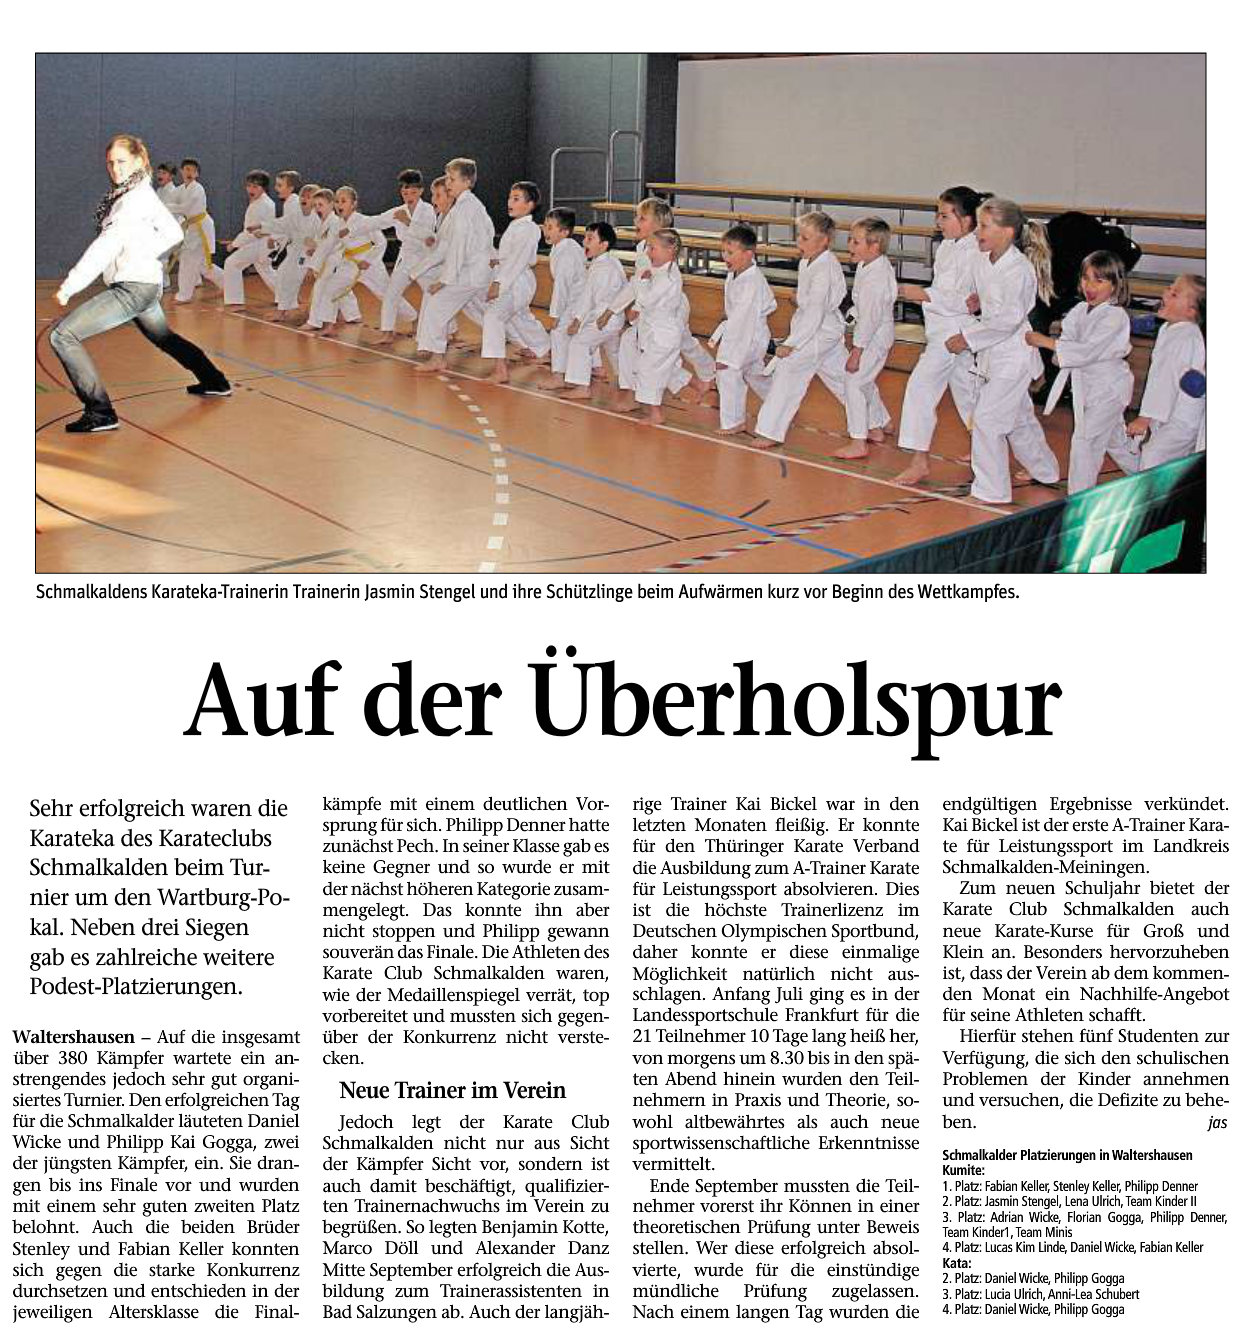 artikel-wartburgpokal2013.jpg